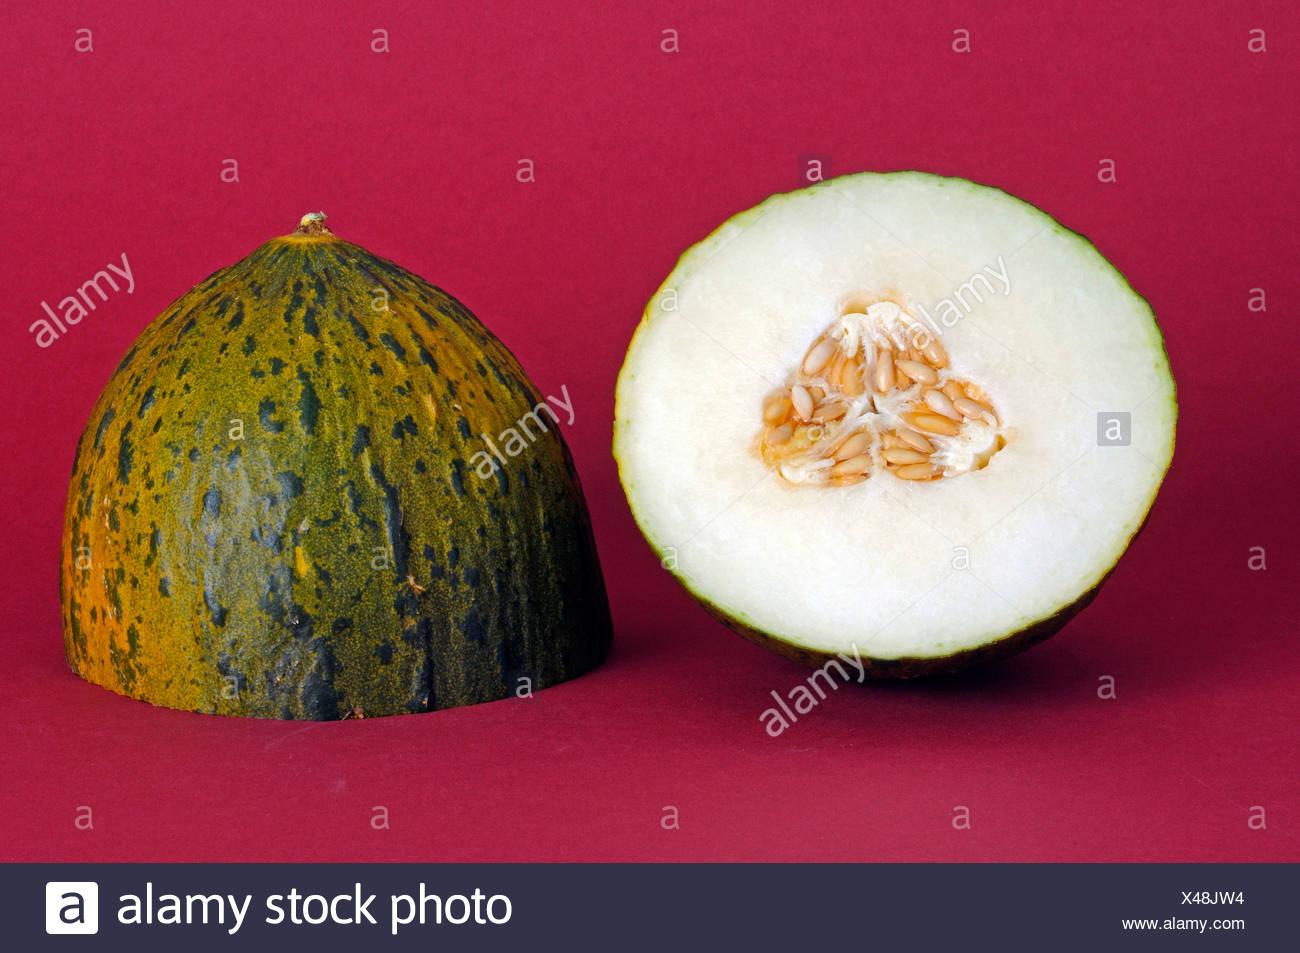 Honigmelone aus Brasilien Stockbild